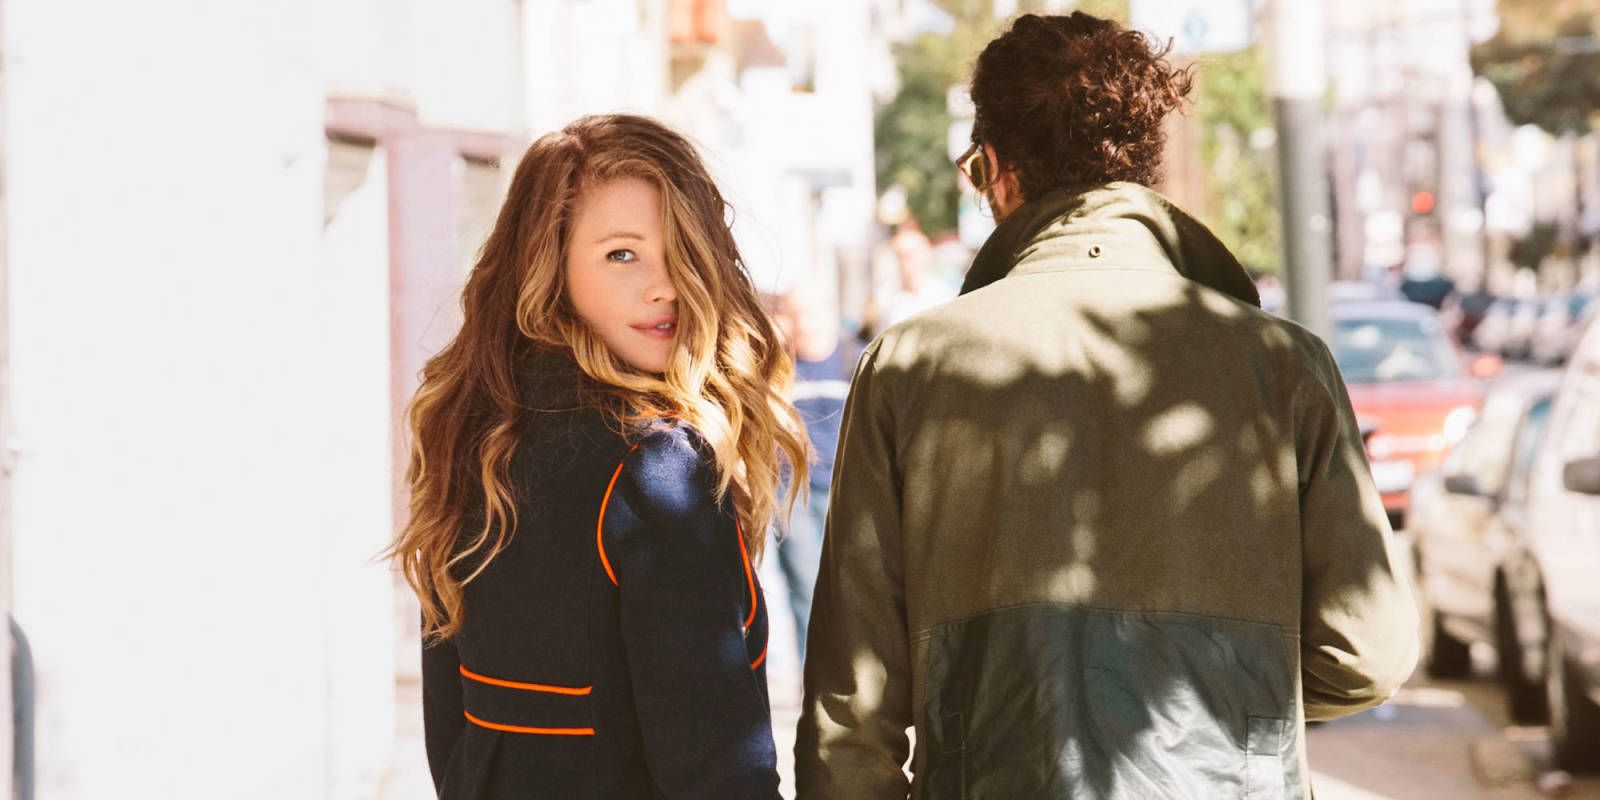 Online Dating Matthew Hussey kvinnlig fet beundrare dating